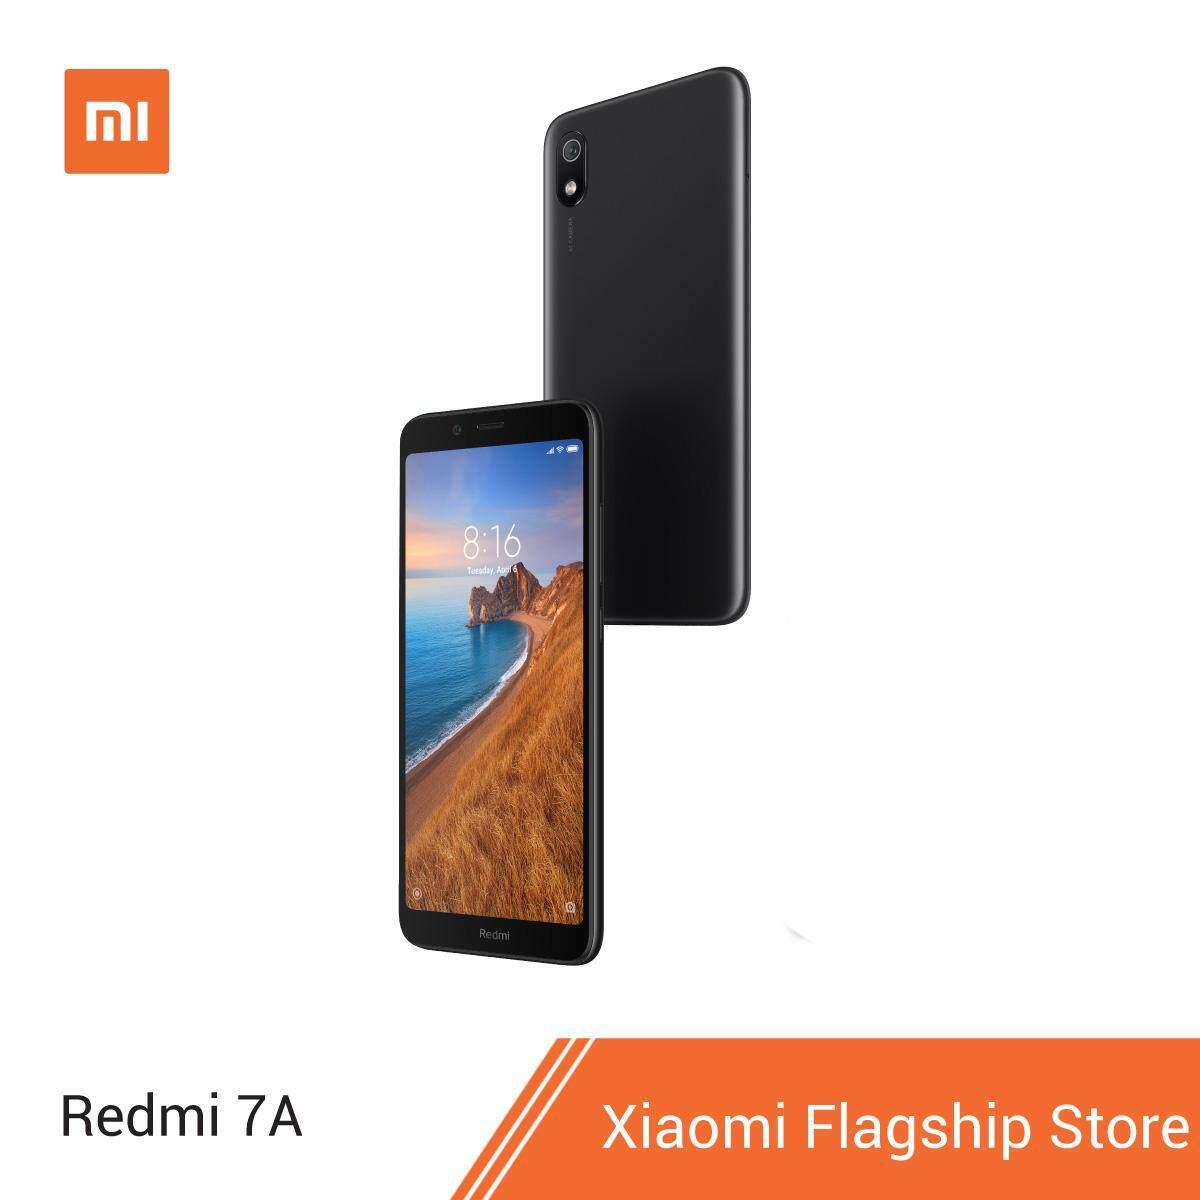 [Pre Order] Xiaomi Redmi 7A (2/32GB) ฟรี! Micro SD Card 32GB เริ่มส่งของวันที่ 11 ก.ค. เป็นต้นไป  - 22650290129a862e126886c6e15ad0cb - หวยหุ้นไทยเที่ยง 14/6/62 ชุดวิเคราะห์ดัชนีหลังเปิดเช้ามาแน่อน